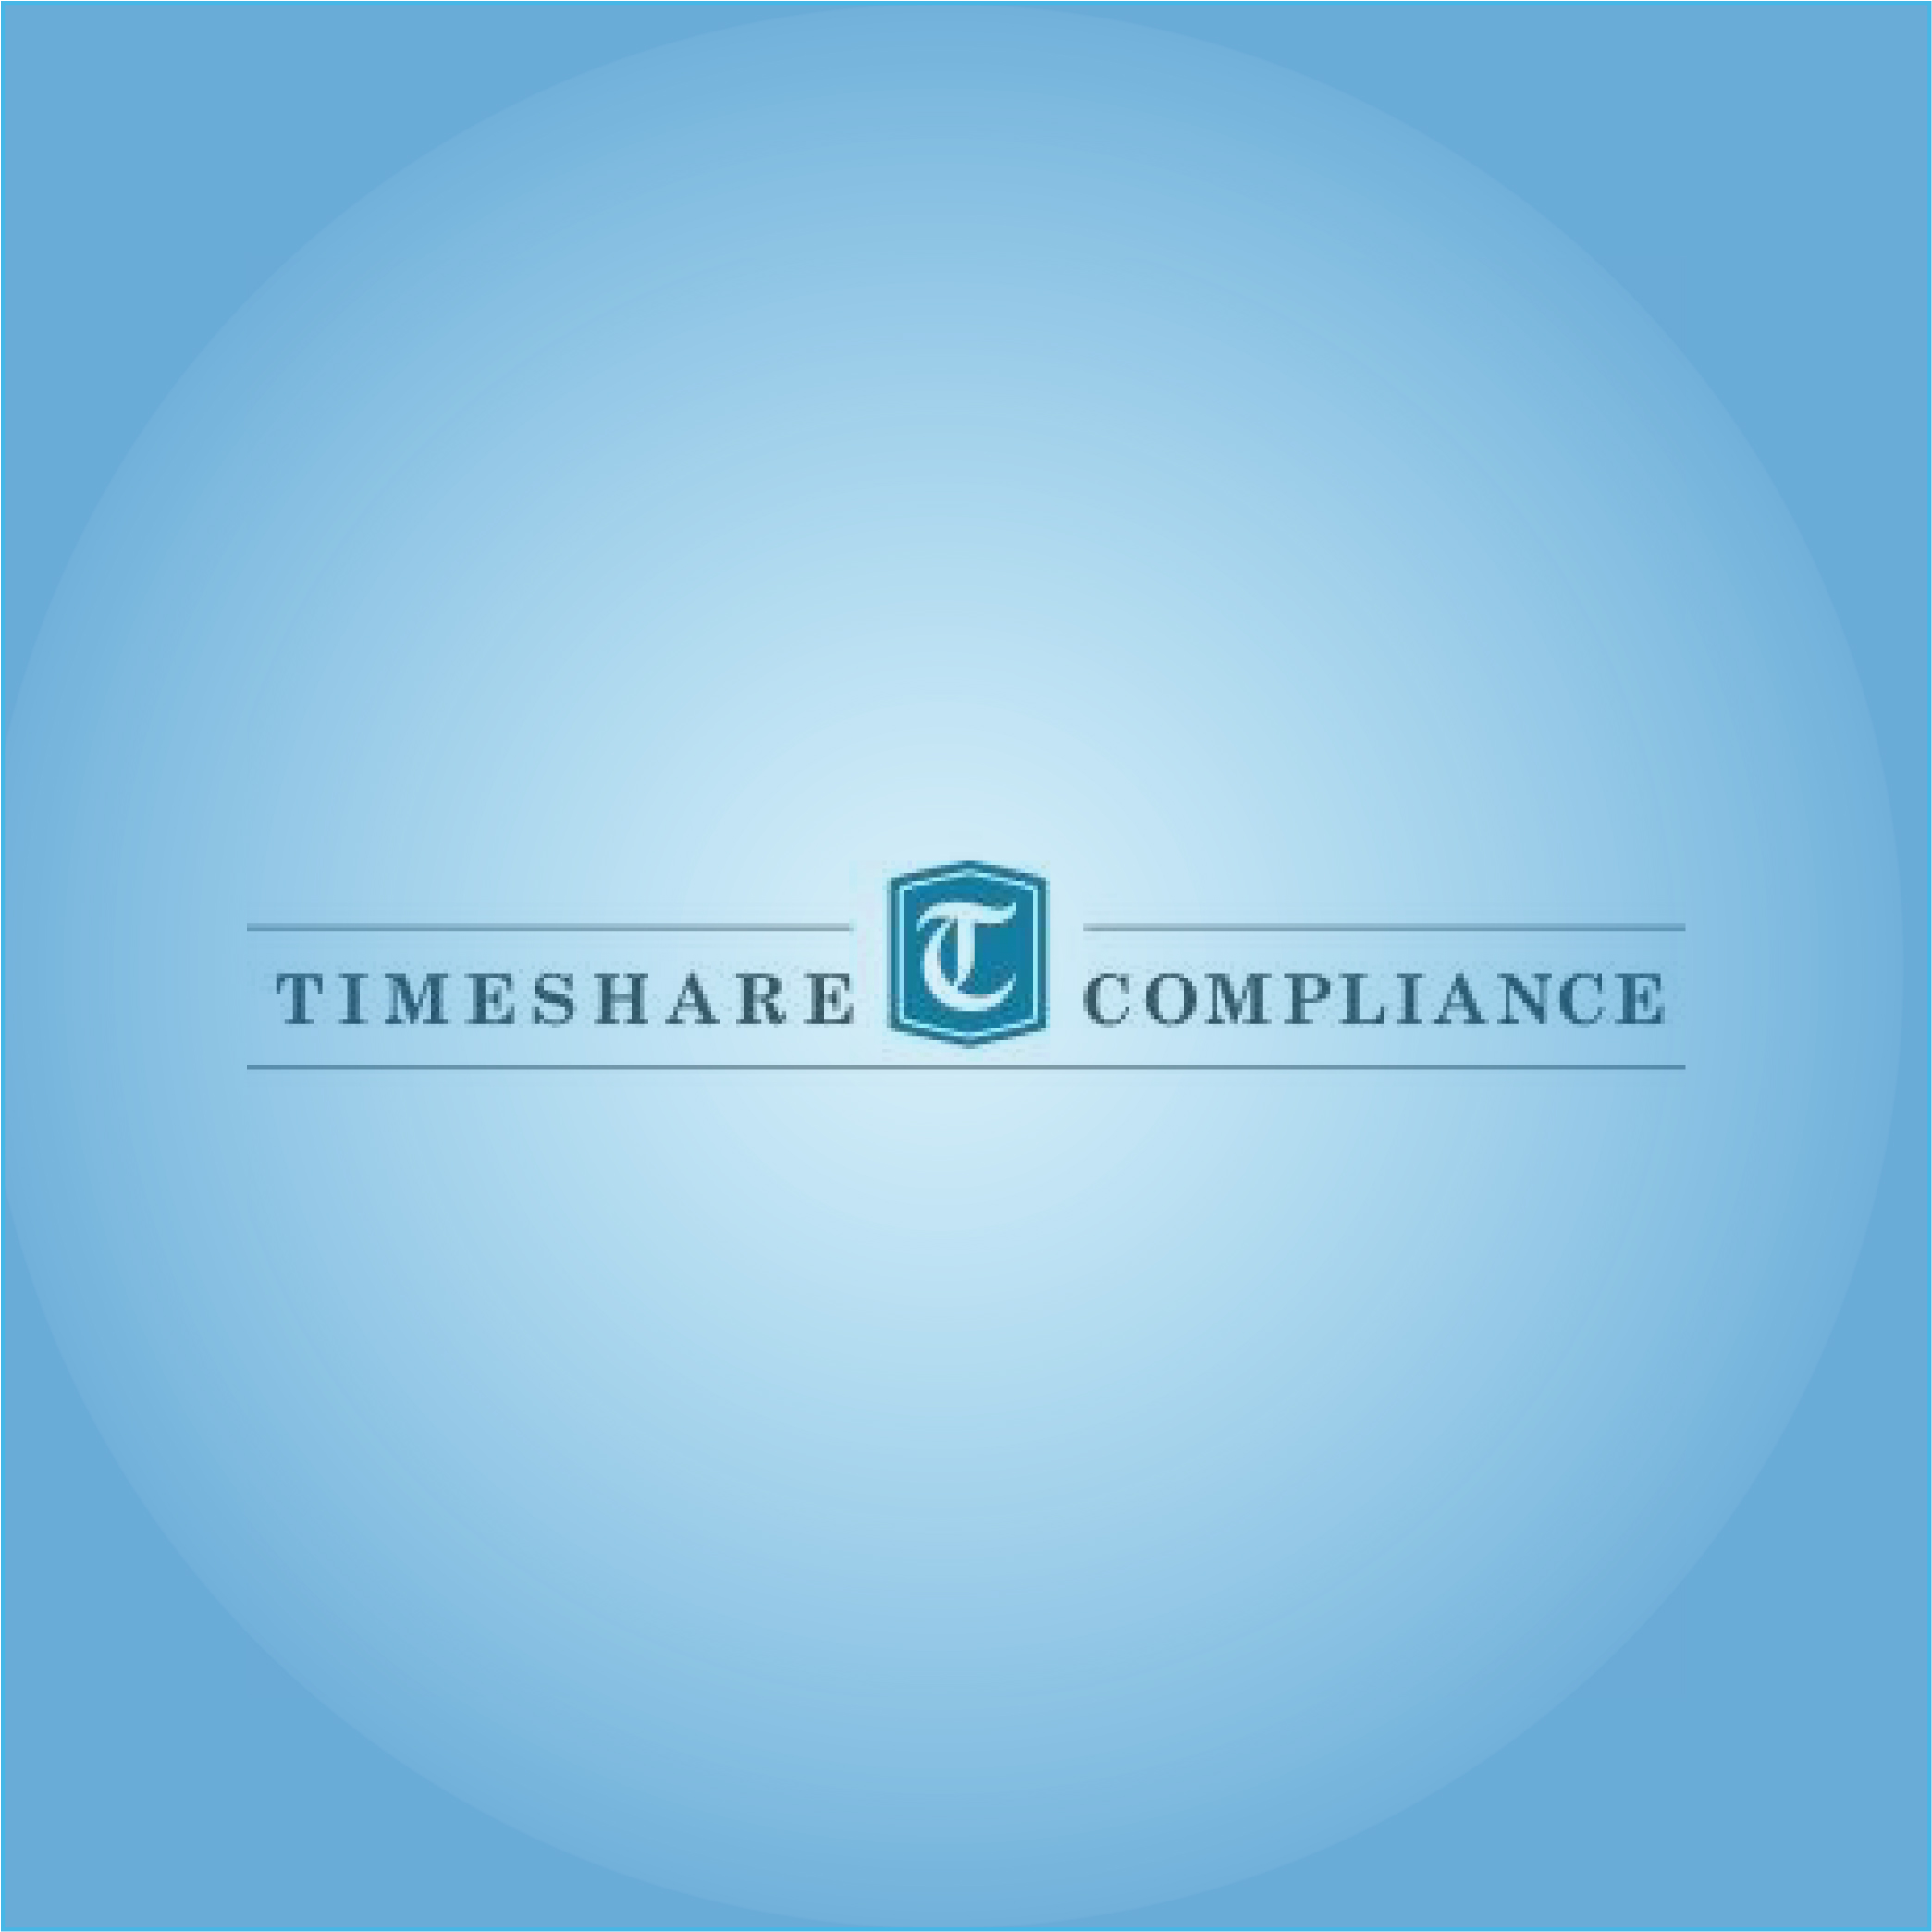 Timeshare Compliance